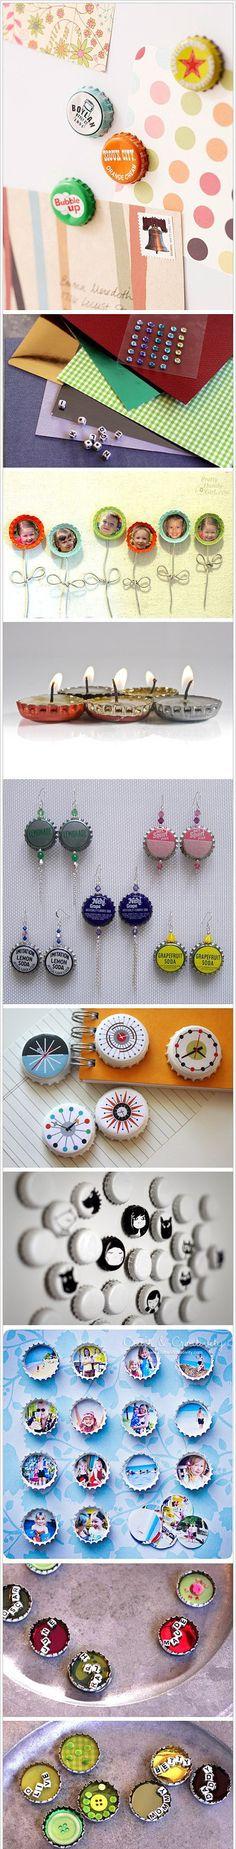 Bottle cap earrings, centerpieces for hair clips & tealites For hair clips and earrings, ideas to paint on: swirls, clocks, bugs, eyeballs, bats, scrollwork, sideshow bullets, skulls, stripes, hearts, letters/fonts,